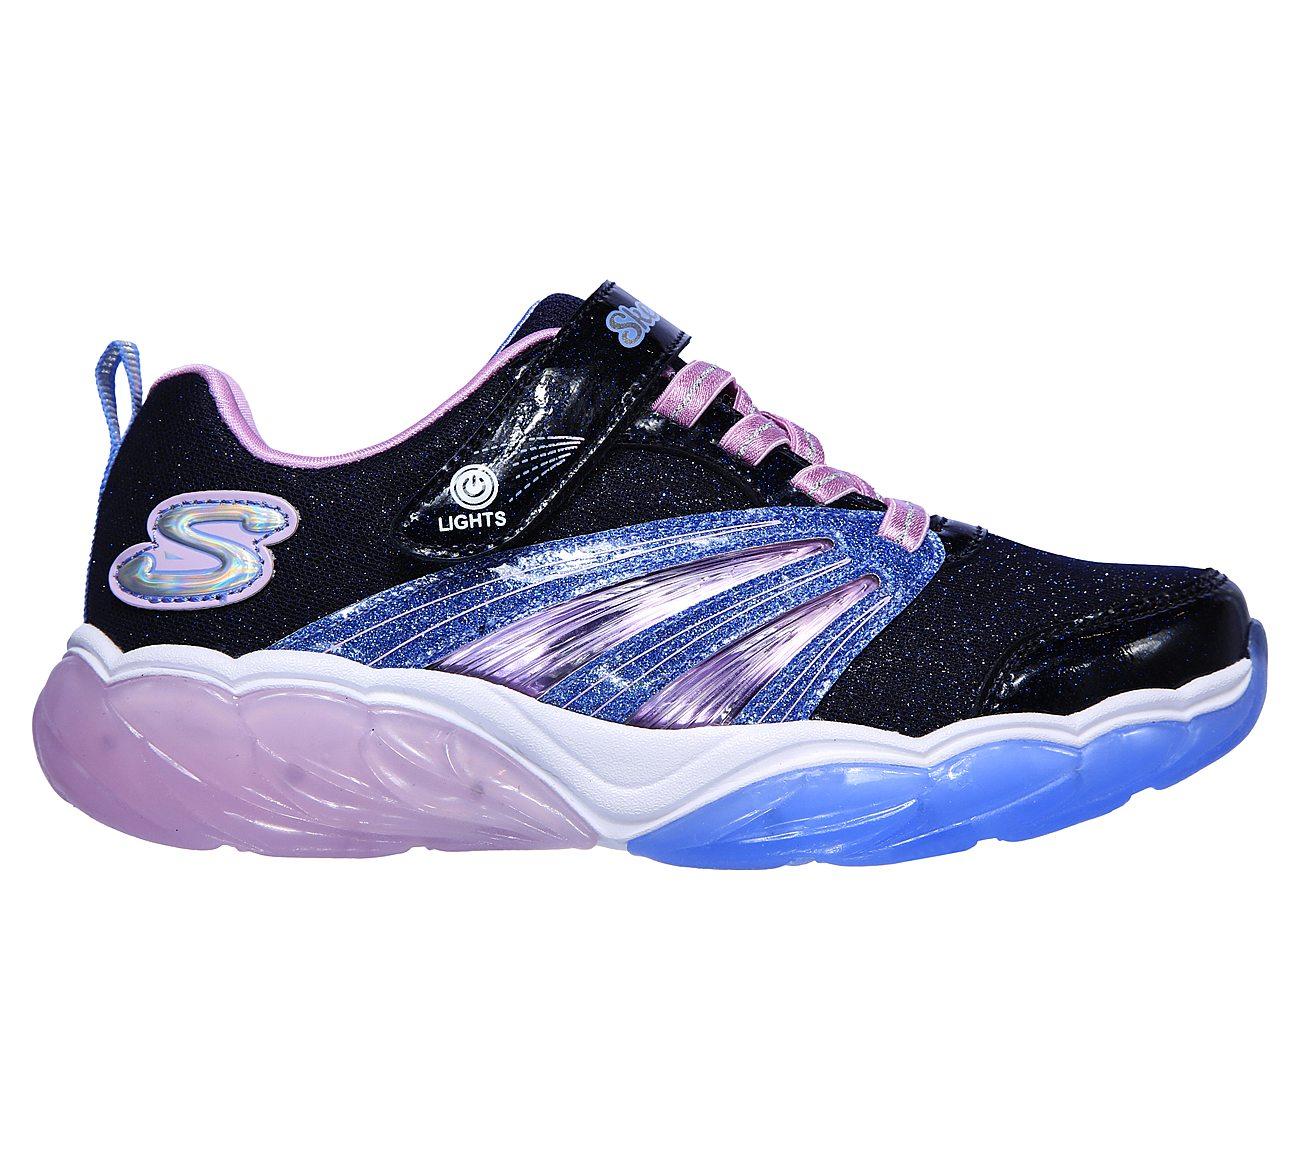 Fusion Flash SKECHERS S-Lights Shoes